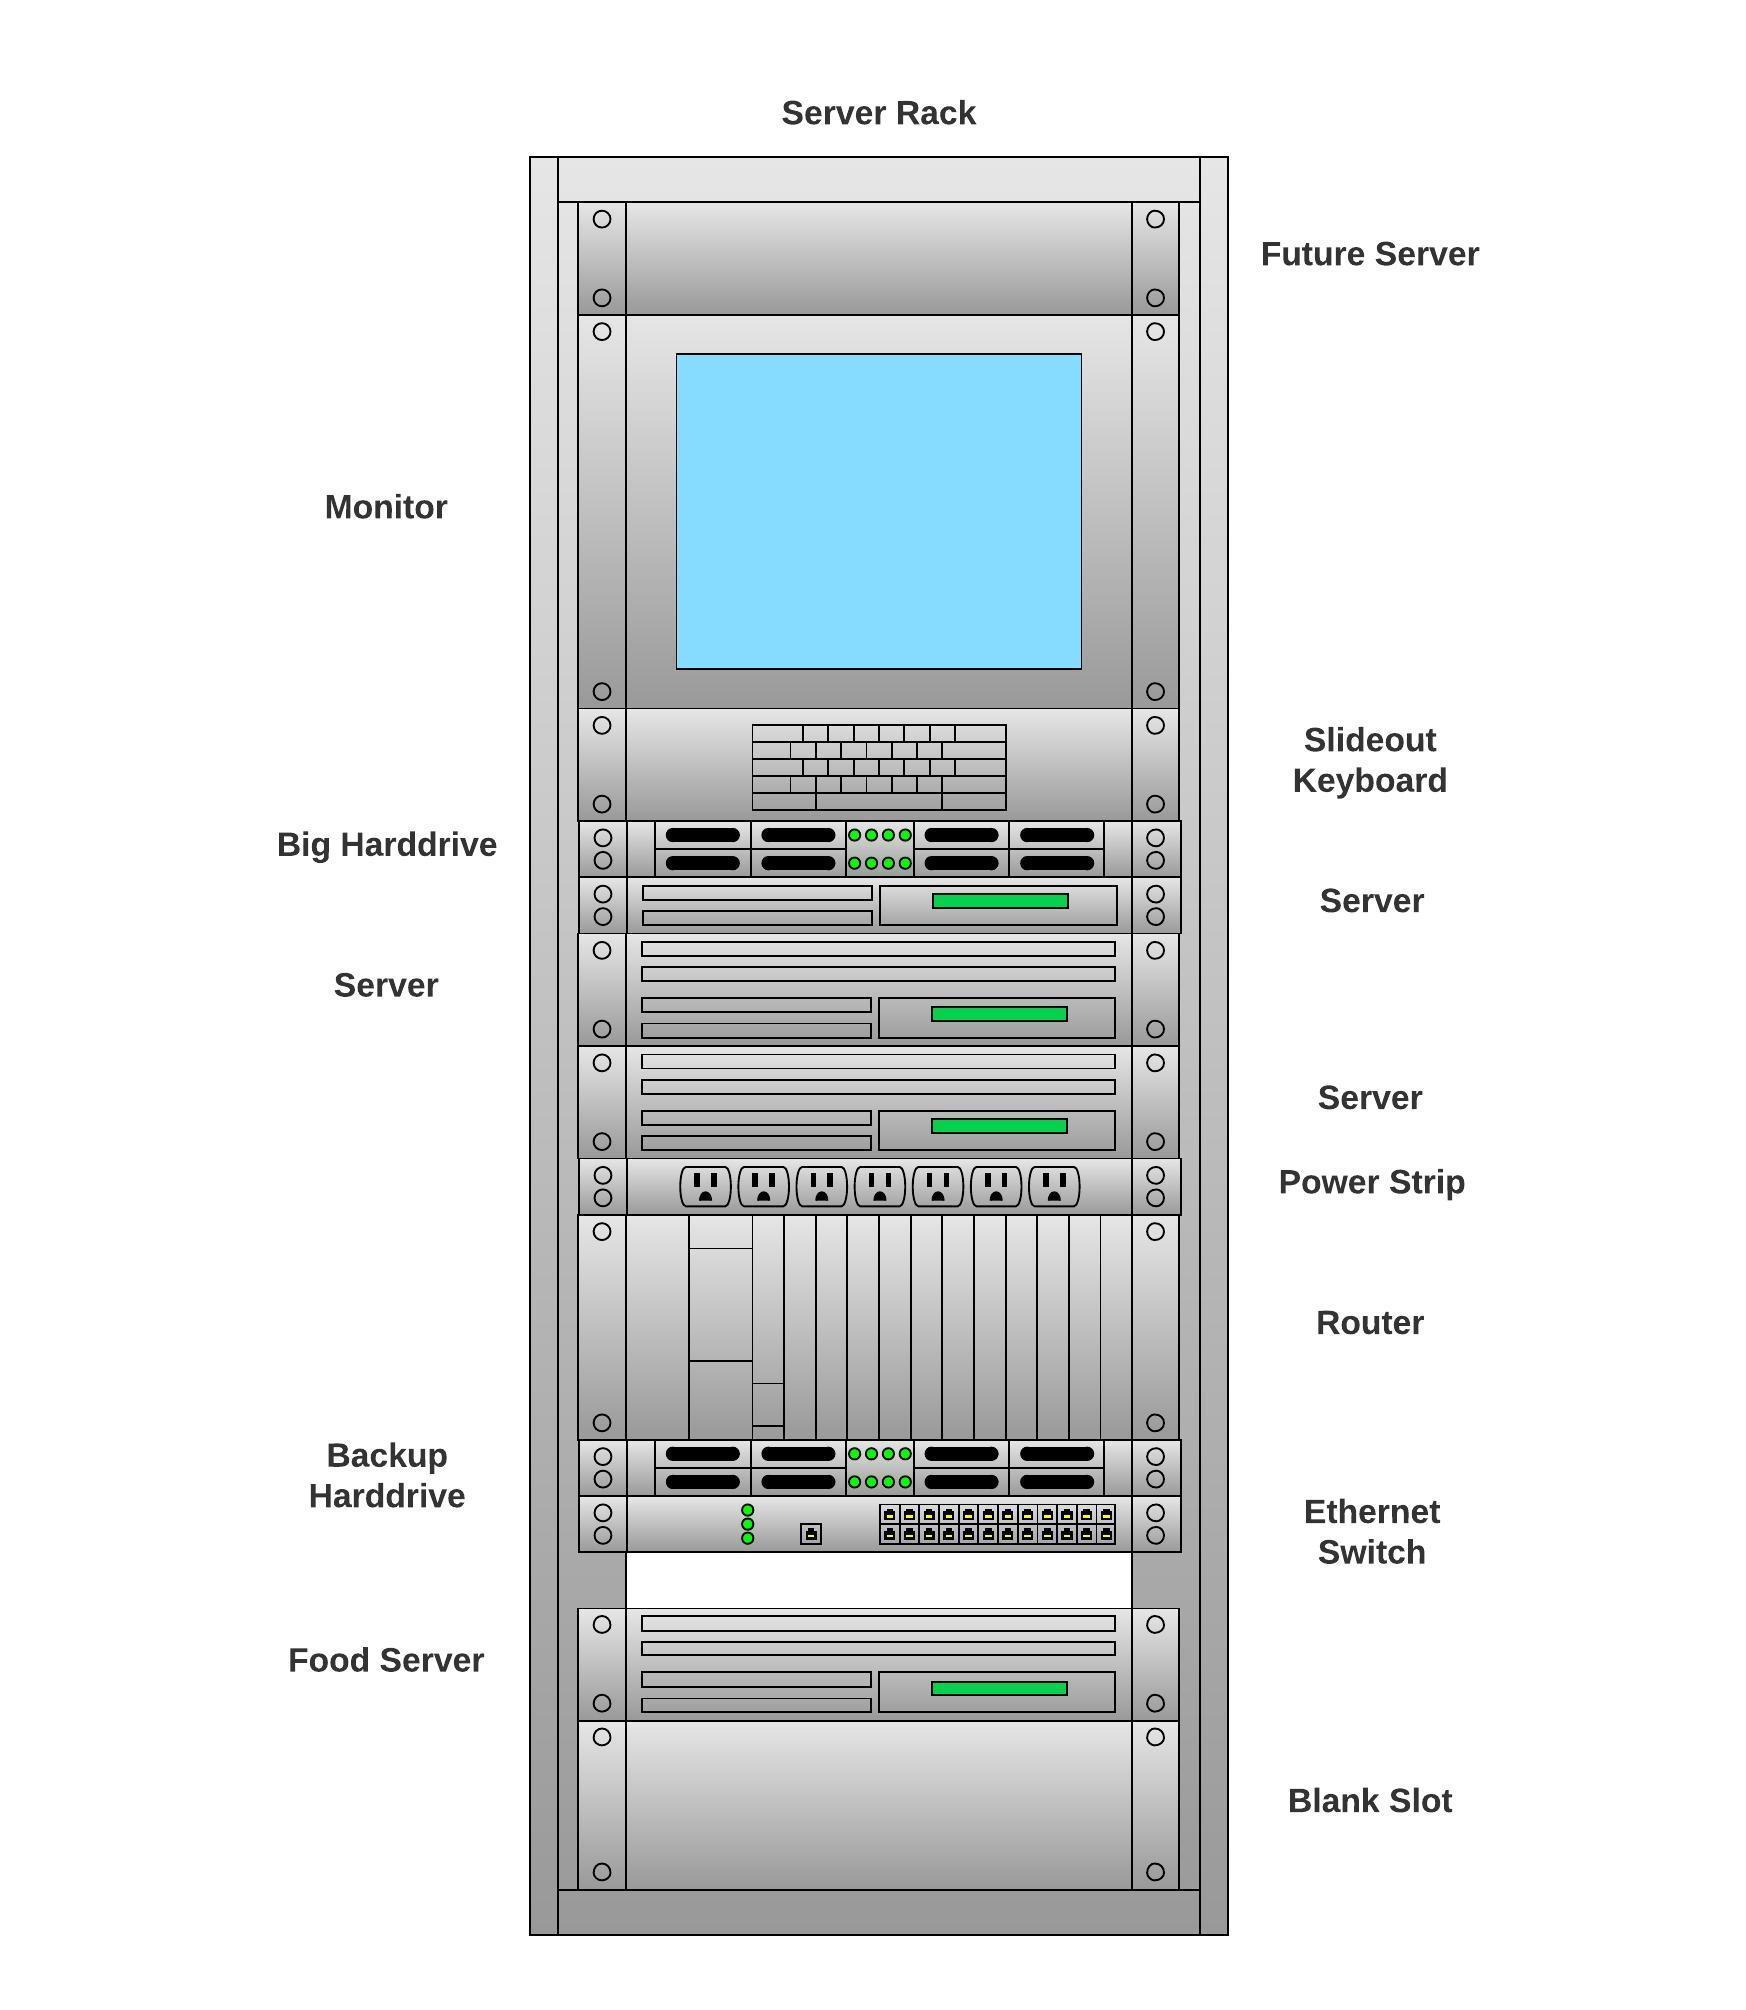 hight resolution of network diagram software lucidchartserver rack diagram